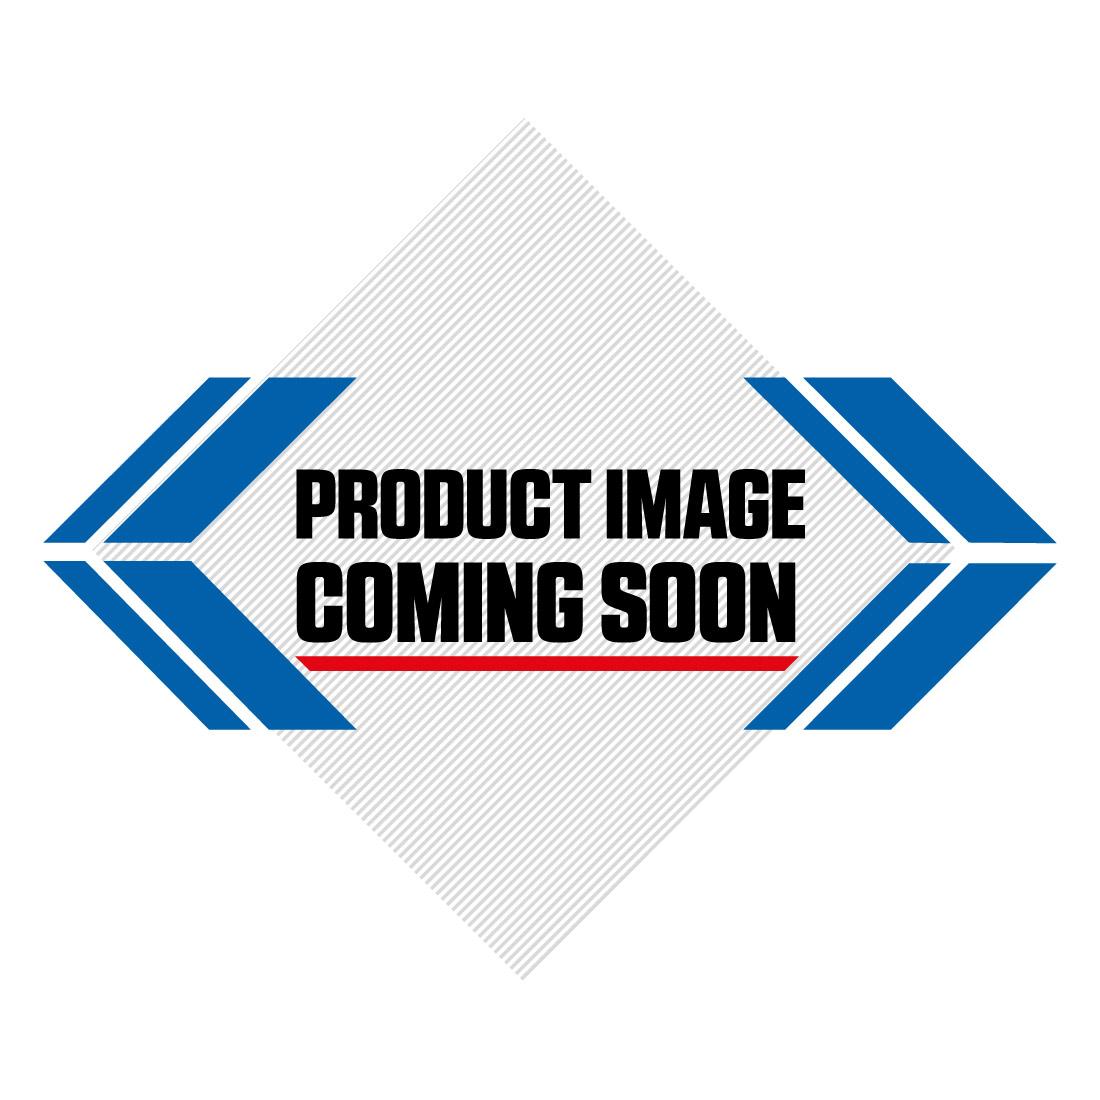 Suzuki Plastic Kit RMZ 450 (08-17) OEM Factory Image-3